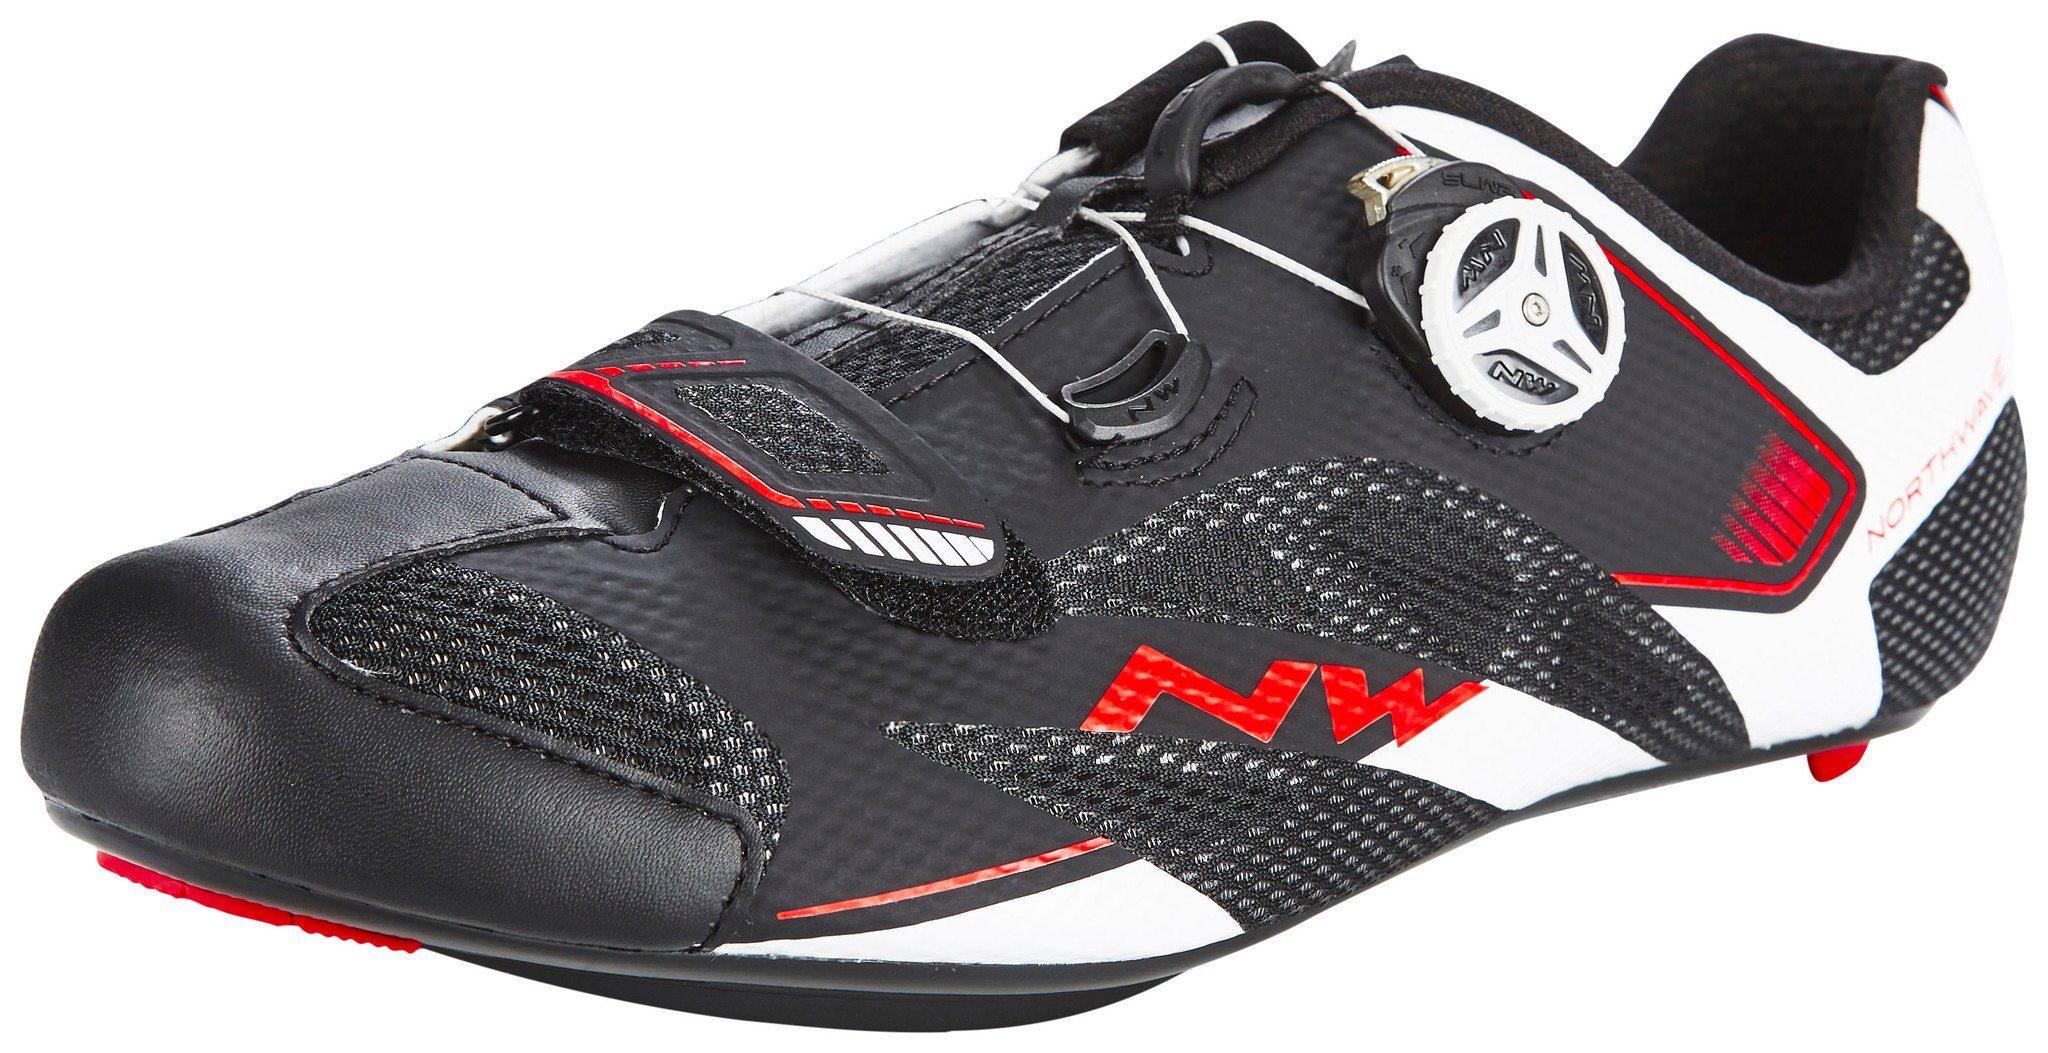 Northwave Fahrradschuhe Sonic 2 Plus Shoes Men  schwarz